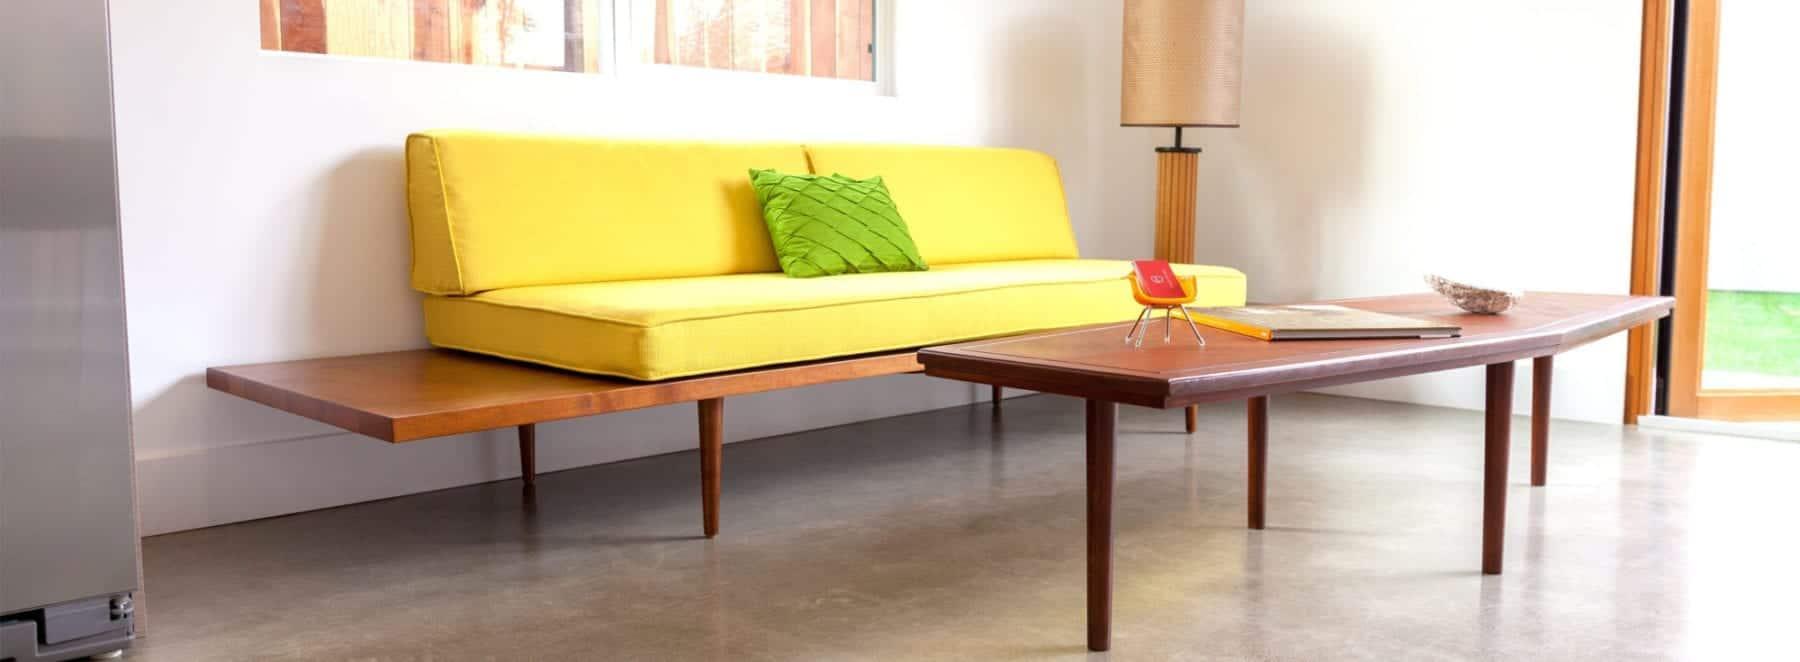 Mid Century Modern Sofa - mad men style sofa | affordable mid century modern furniture